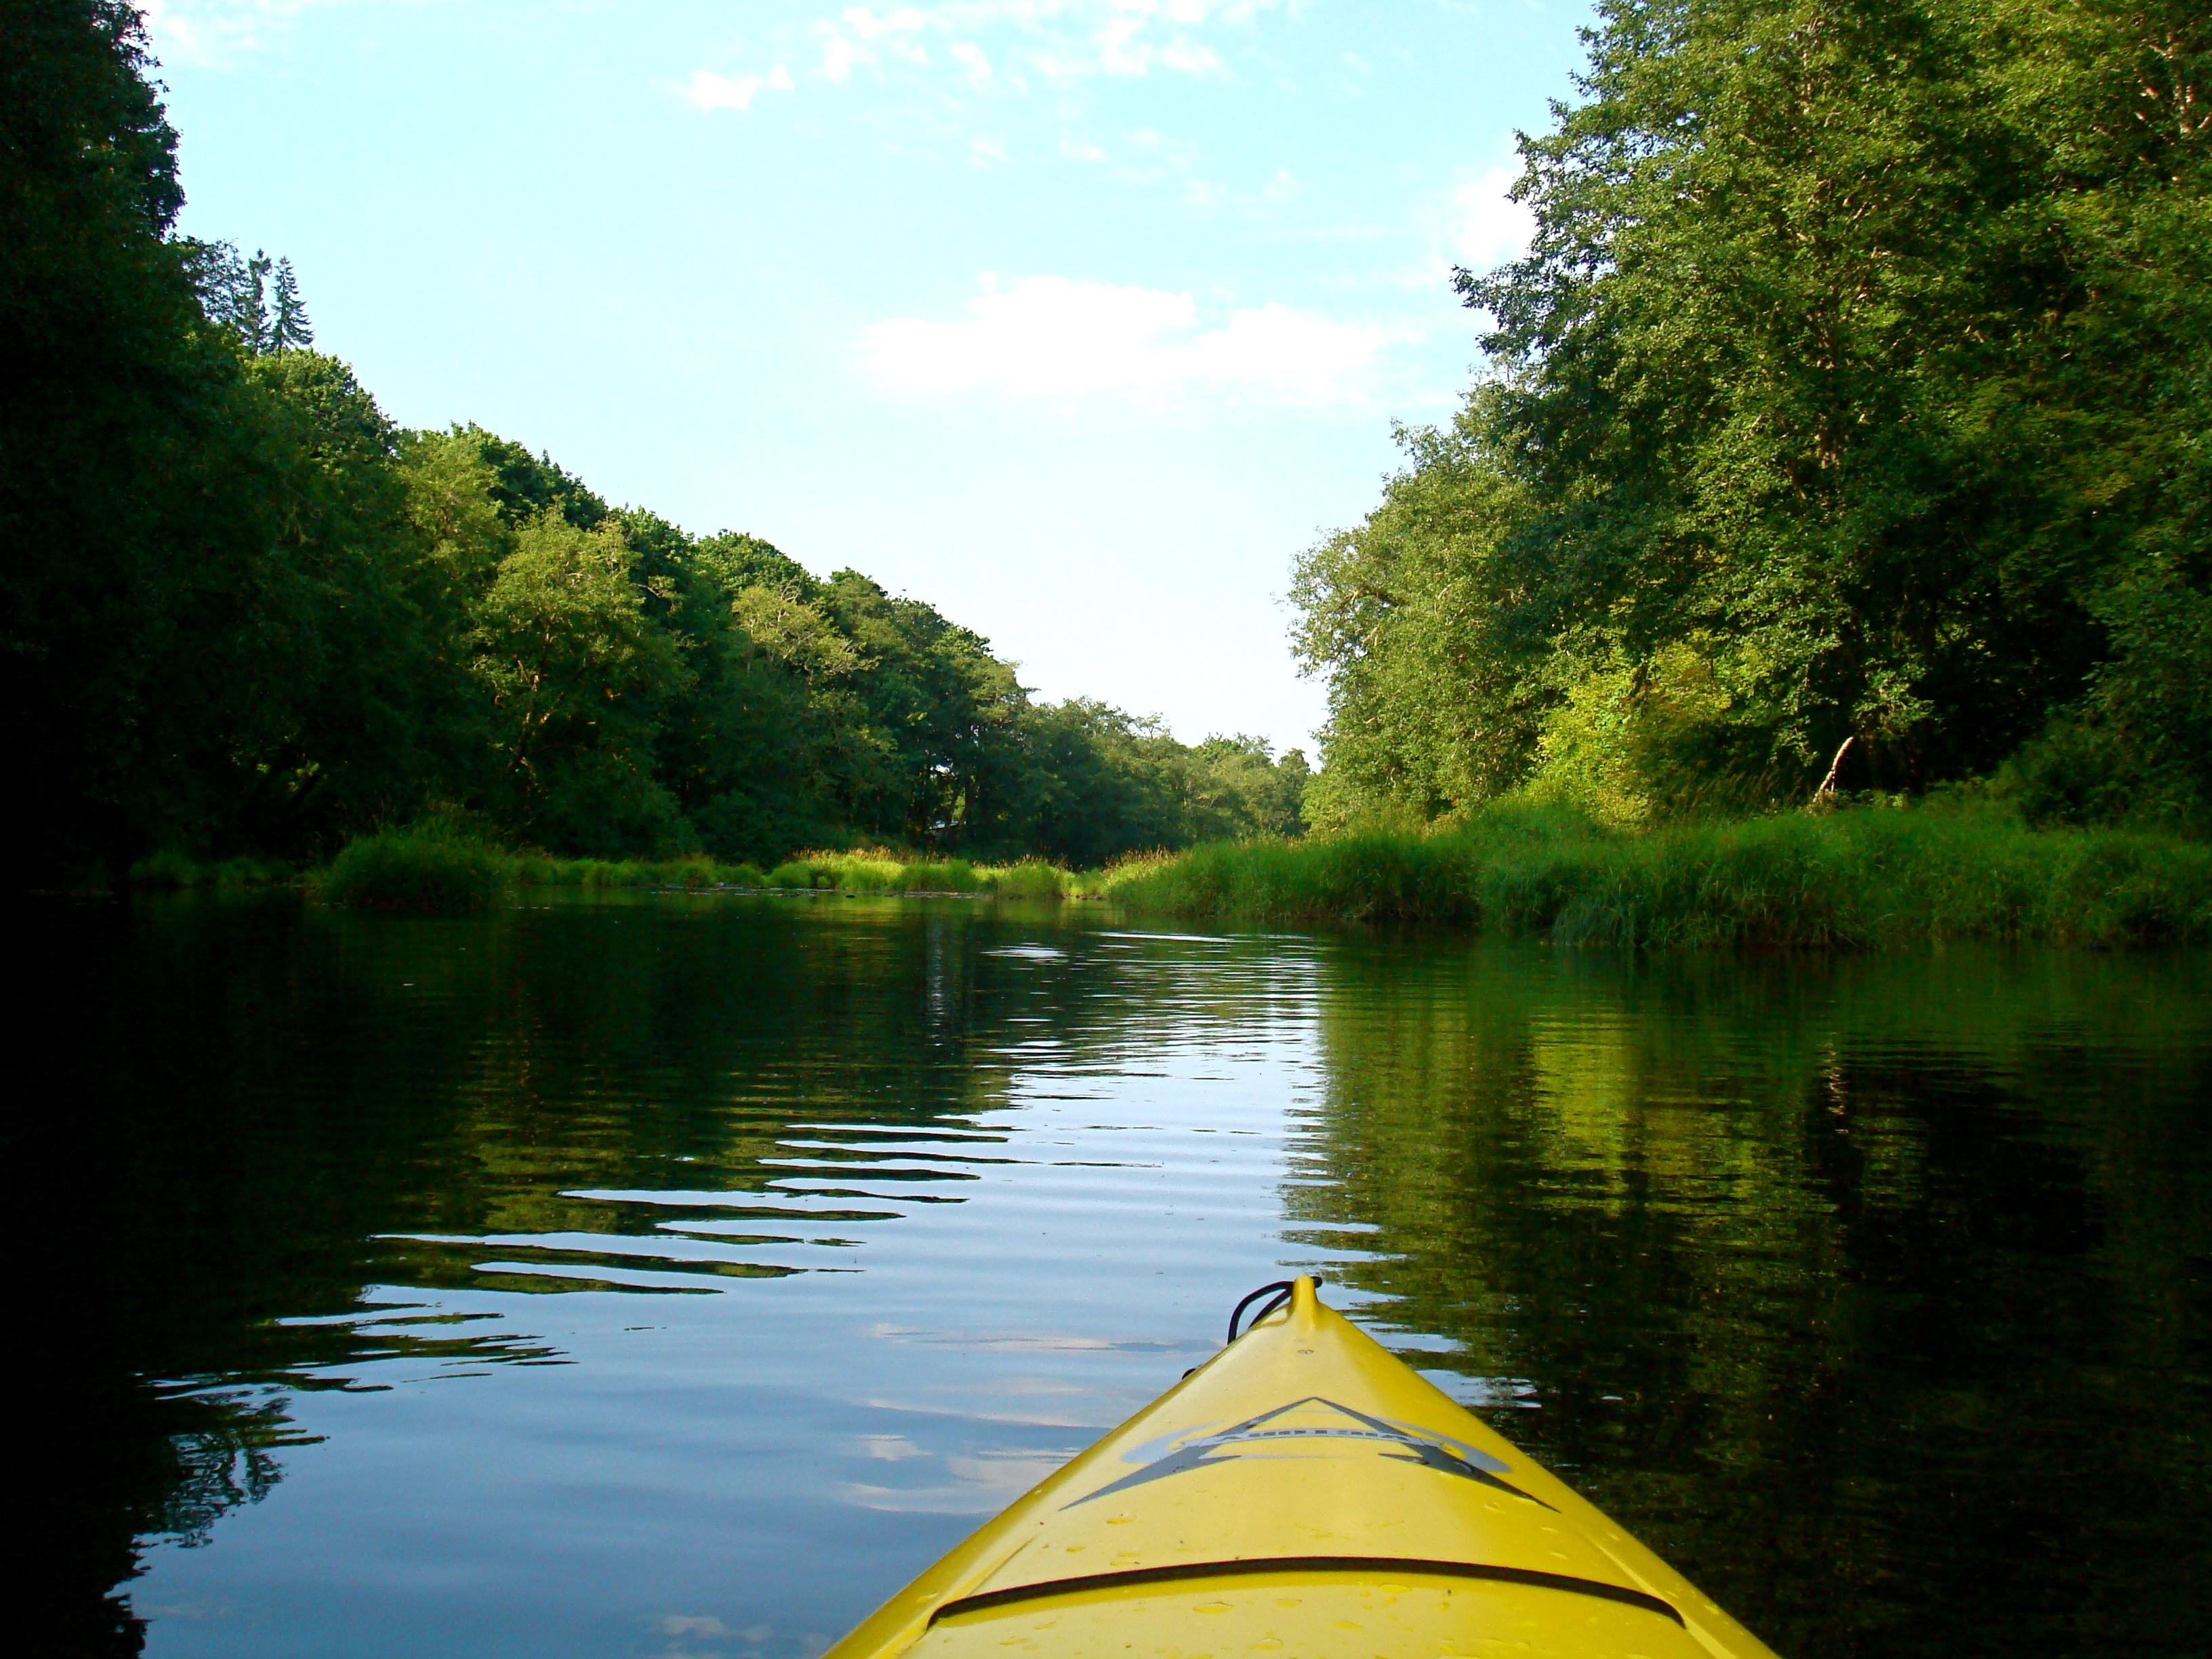 Kayak On River Tierra Valentine Foundmyself